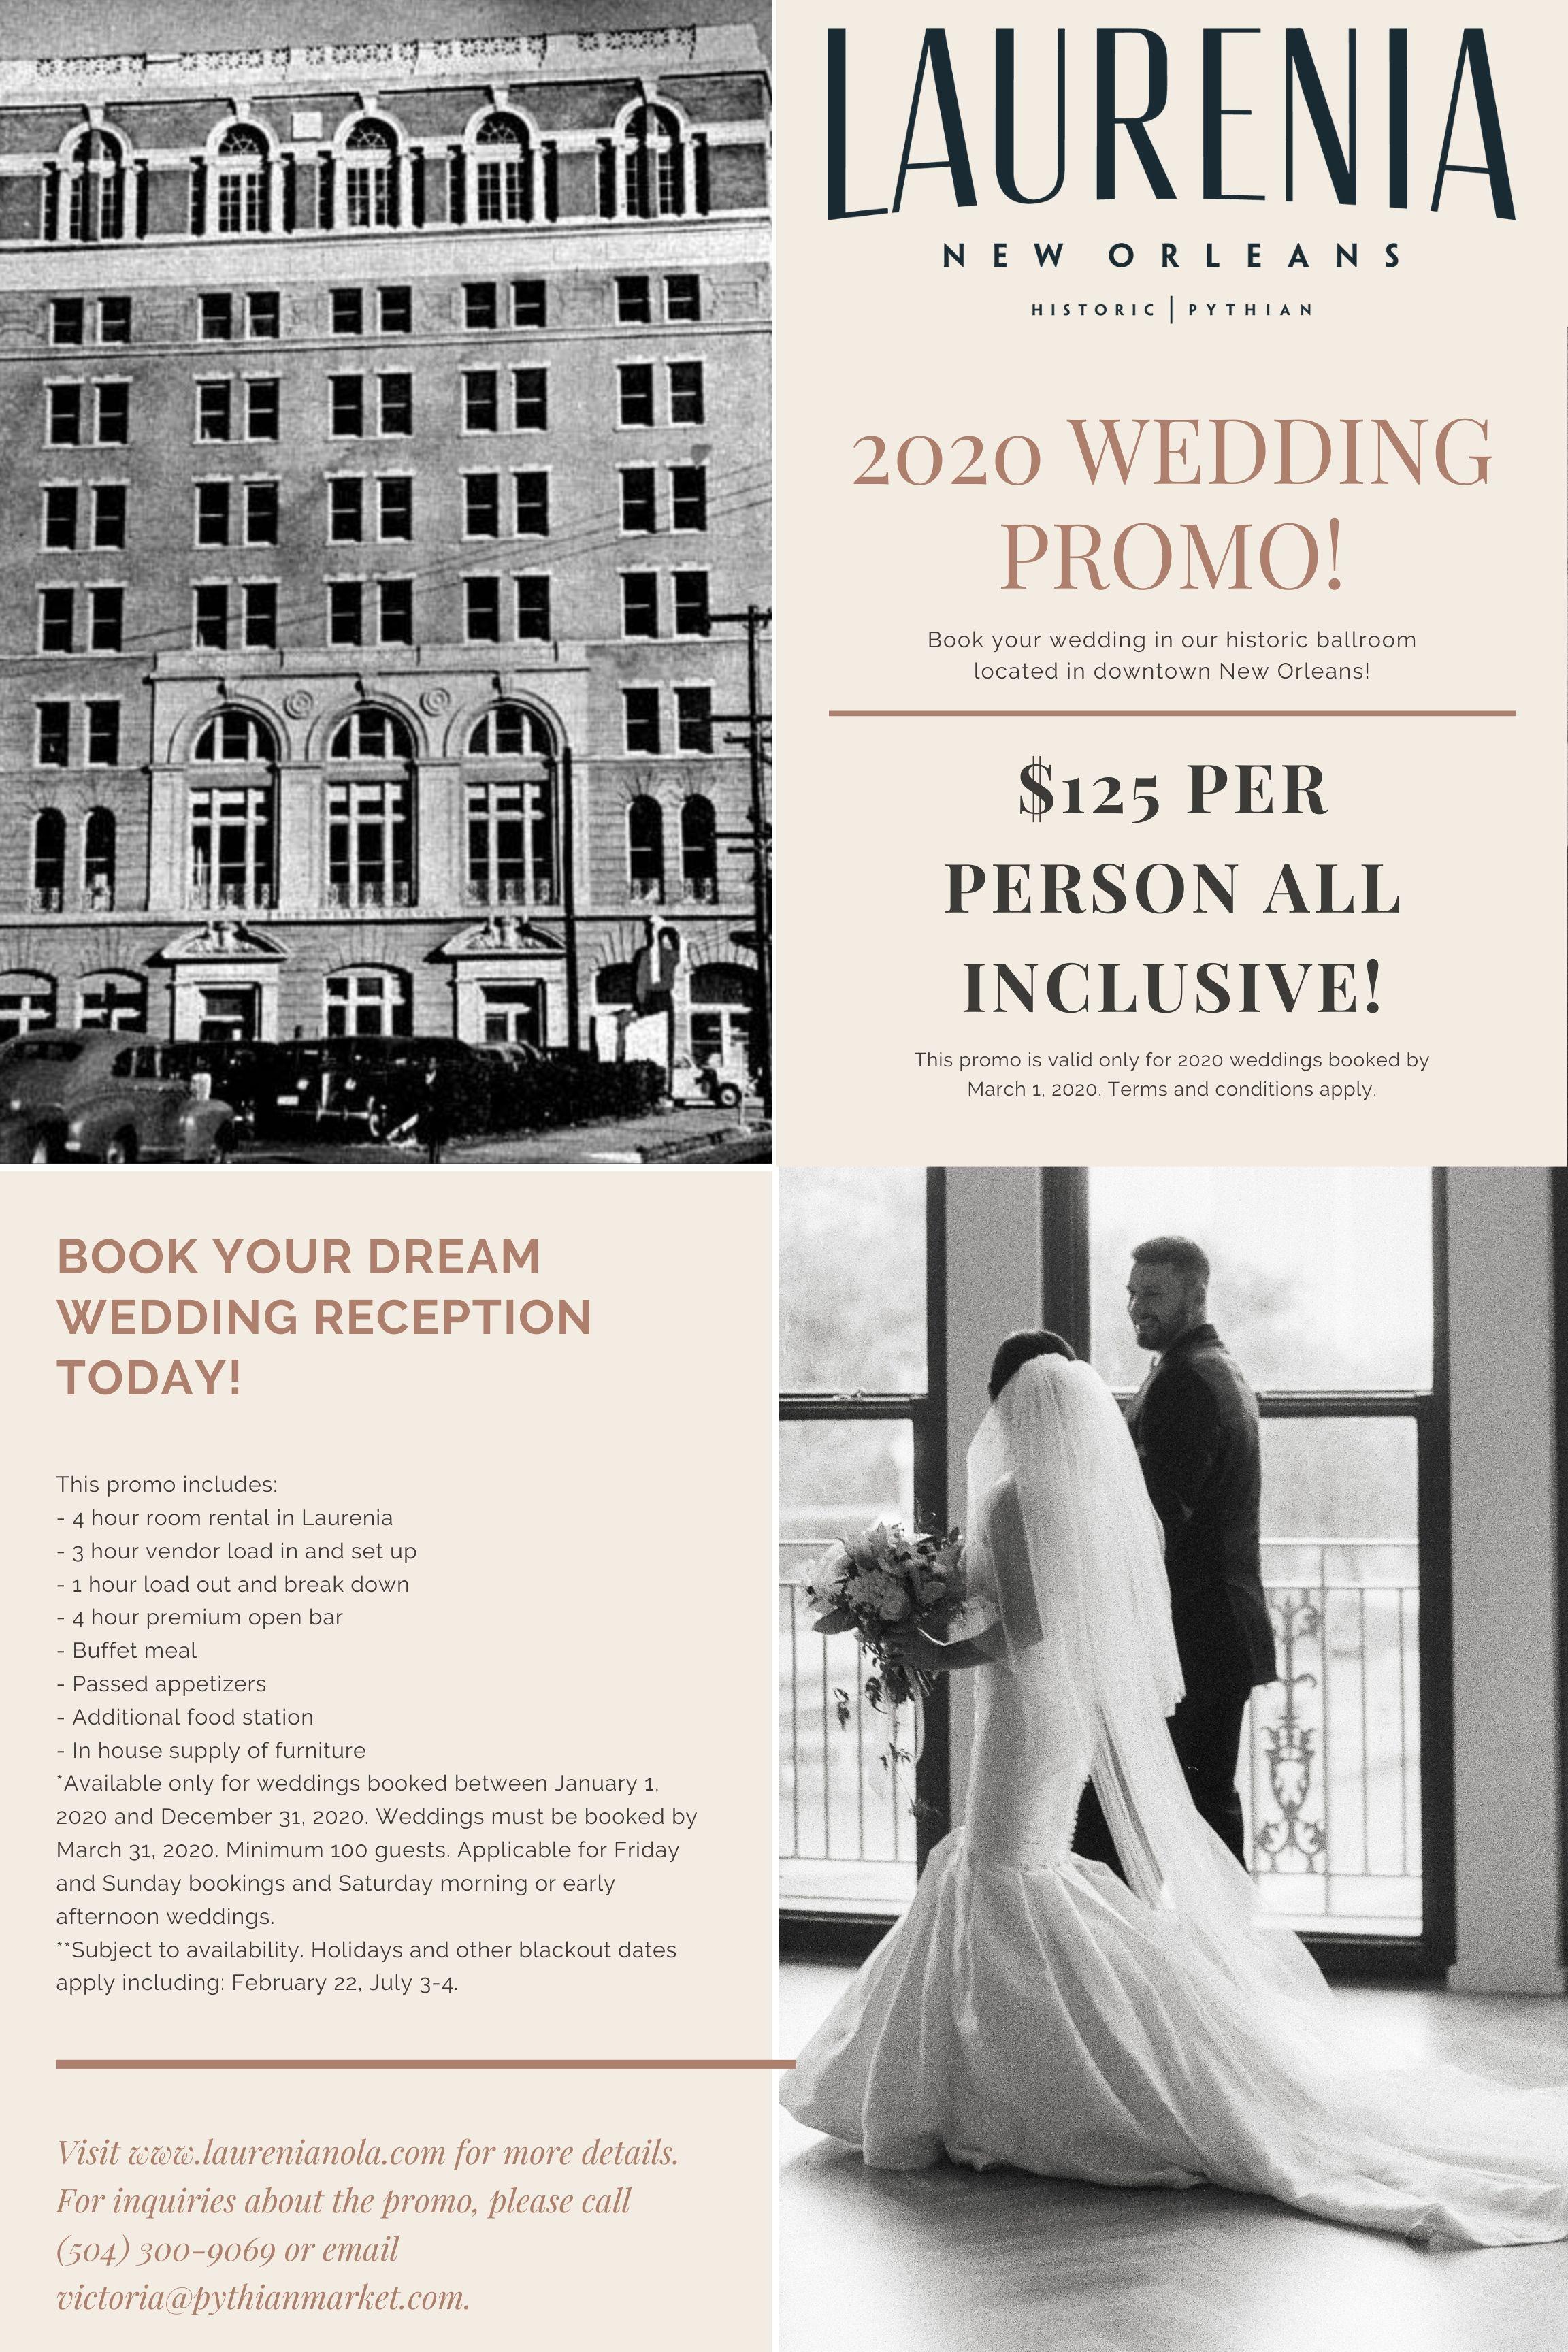 2020 Wedding Promo